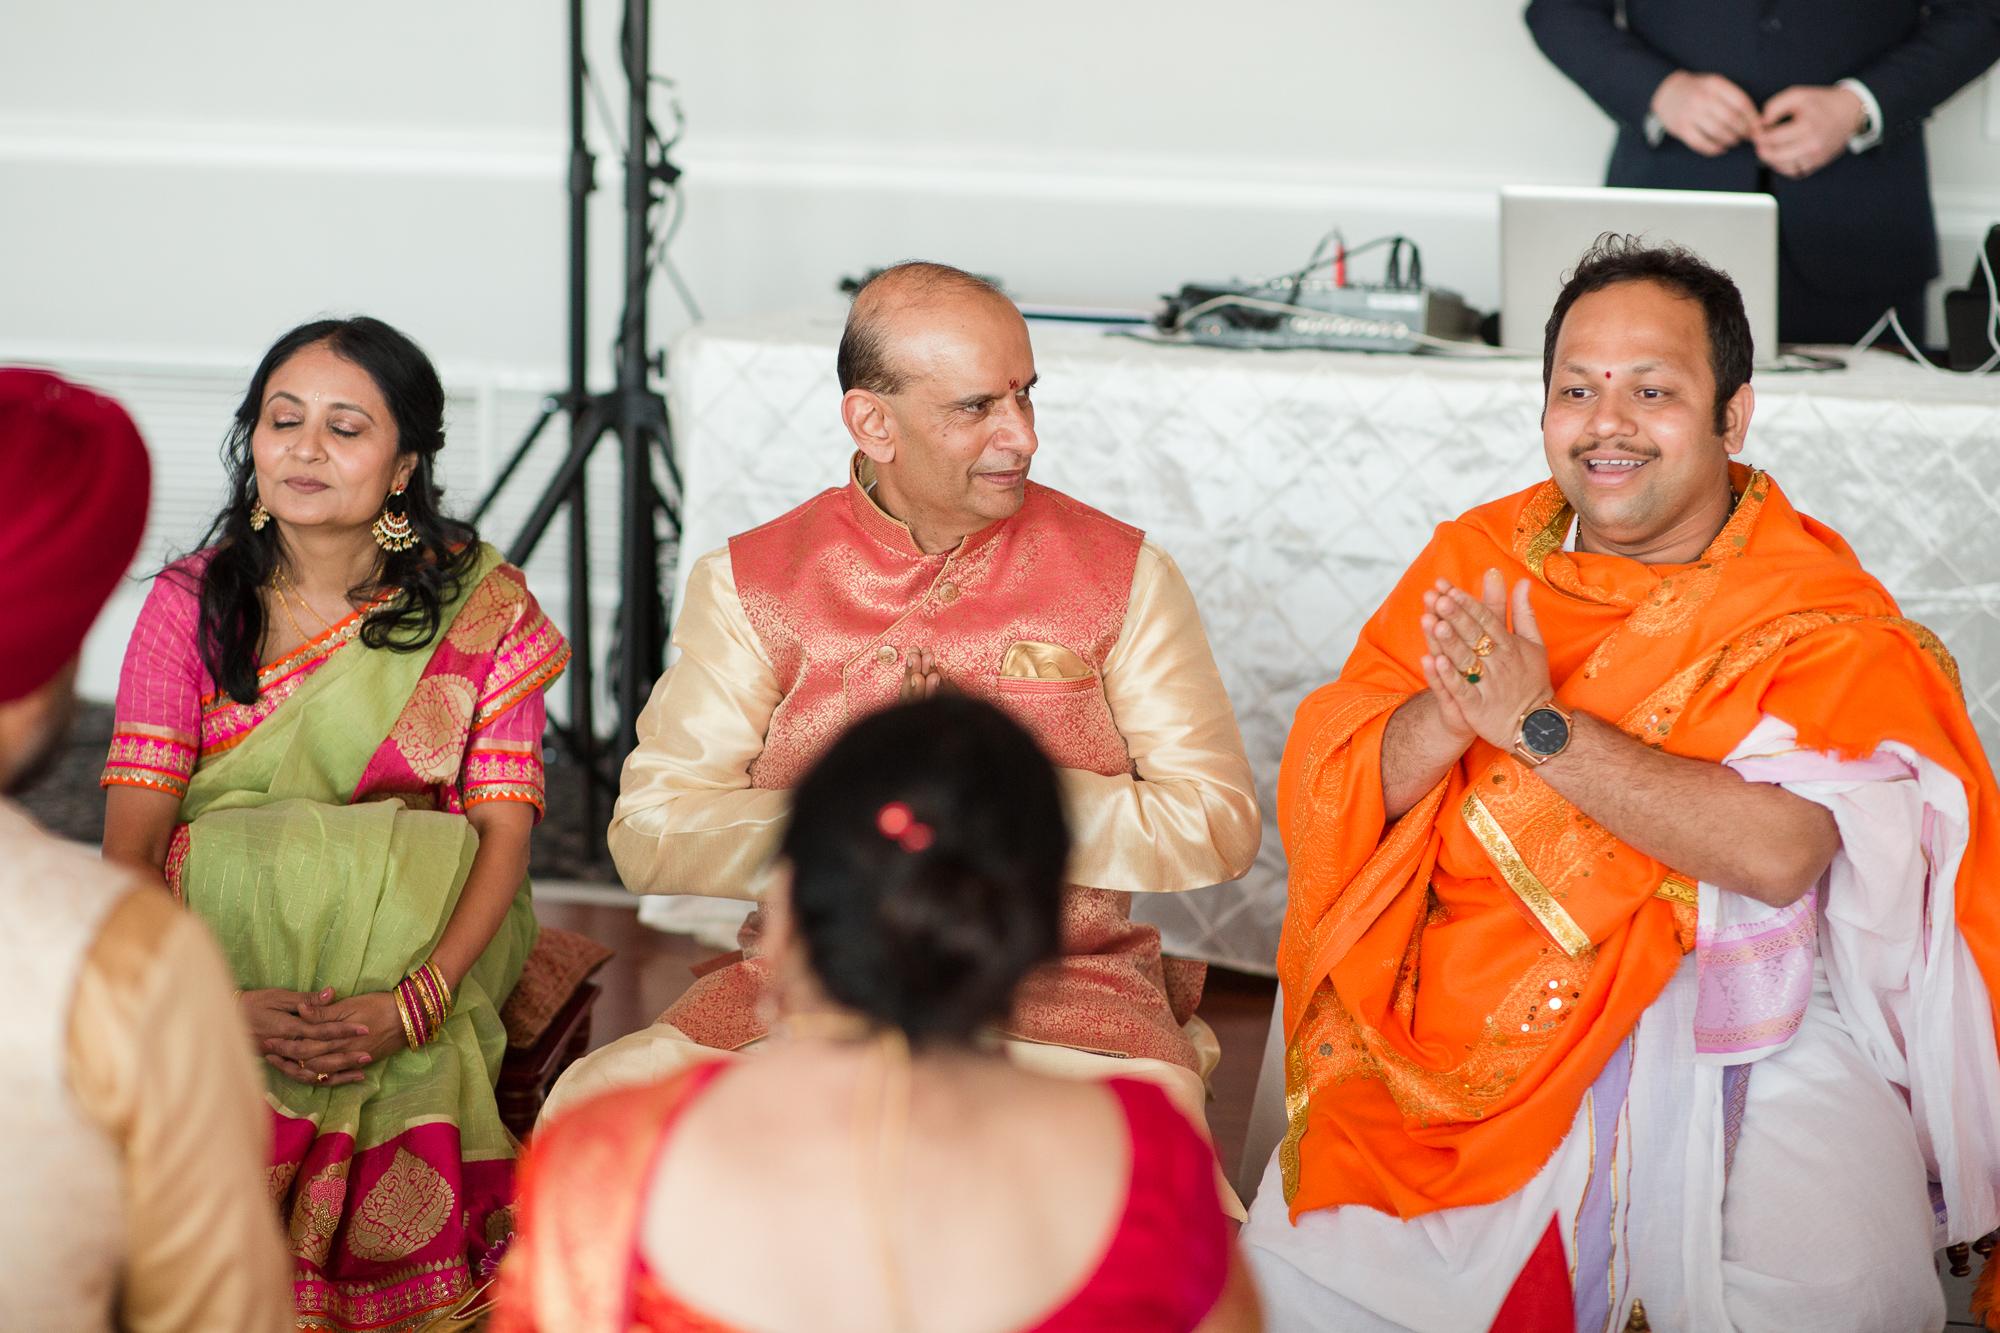 anumeet and gopika, indian engagement ring ceremony, top of the town, alexandria, northern virginia, nova weddings-65.jpg